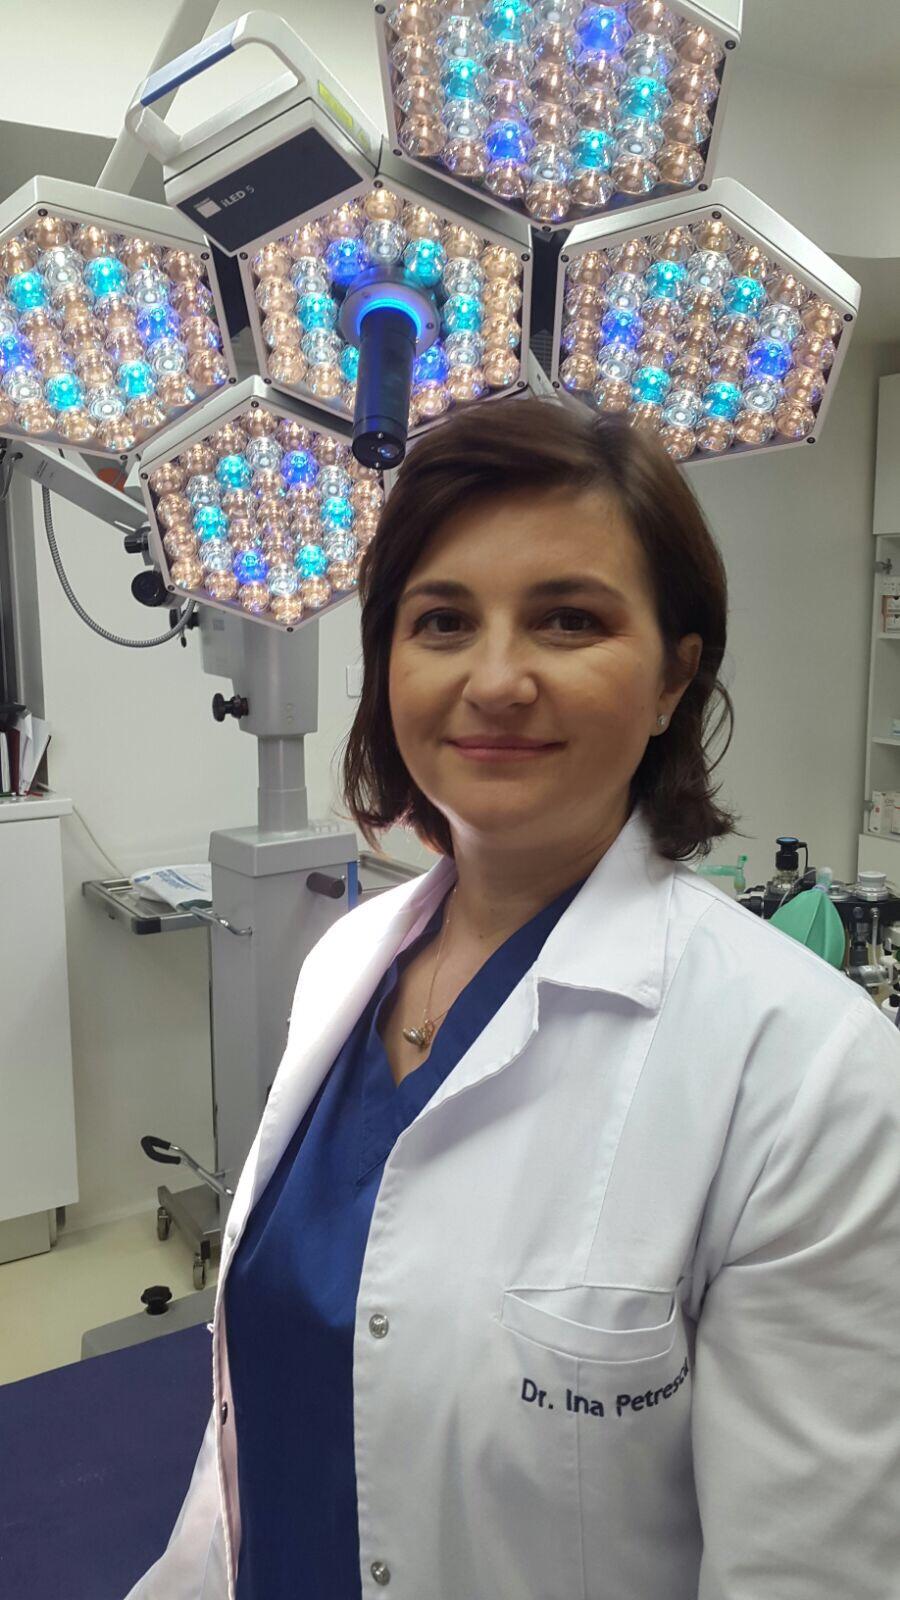 Femei in chirurgie: Chirurgie plastica si microchirurgie reconstructiva